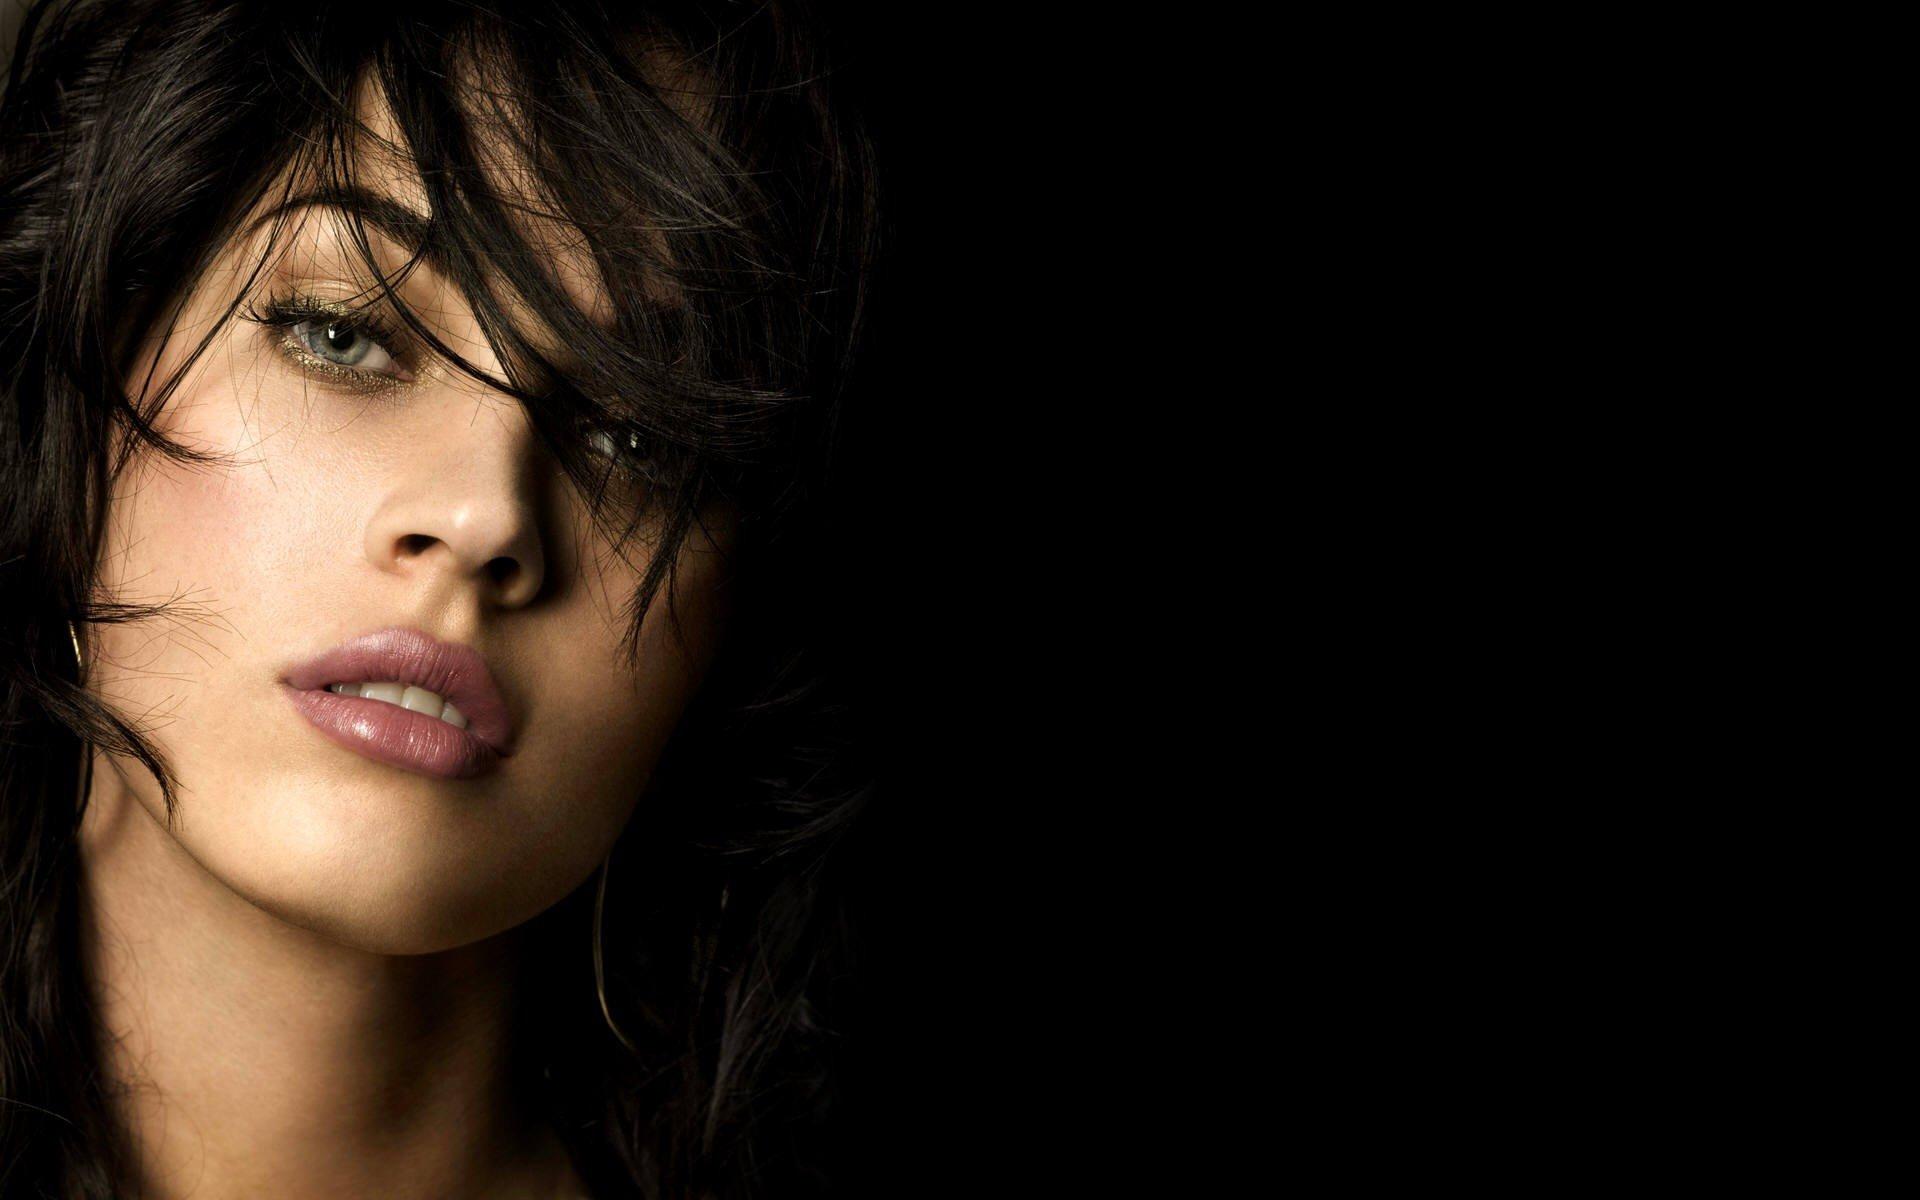 women, Model, Megan Fox, Actress, Face Wallpaper